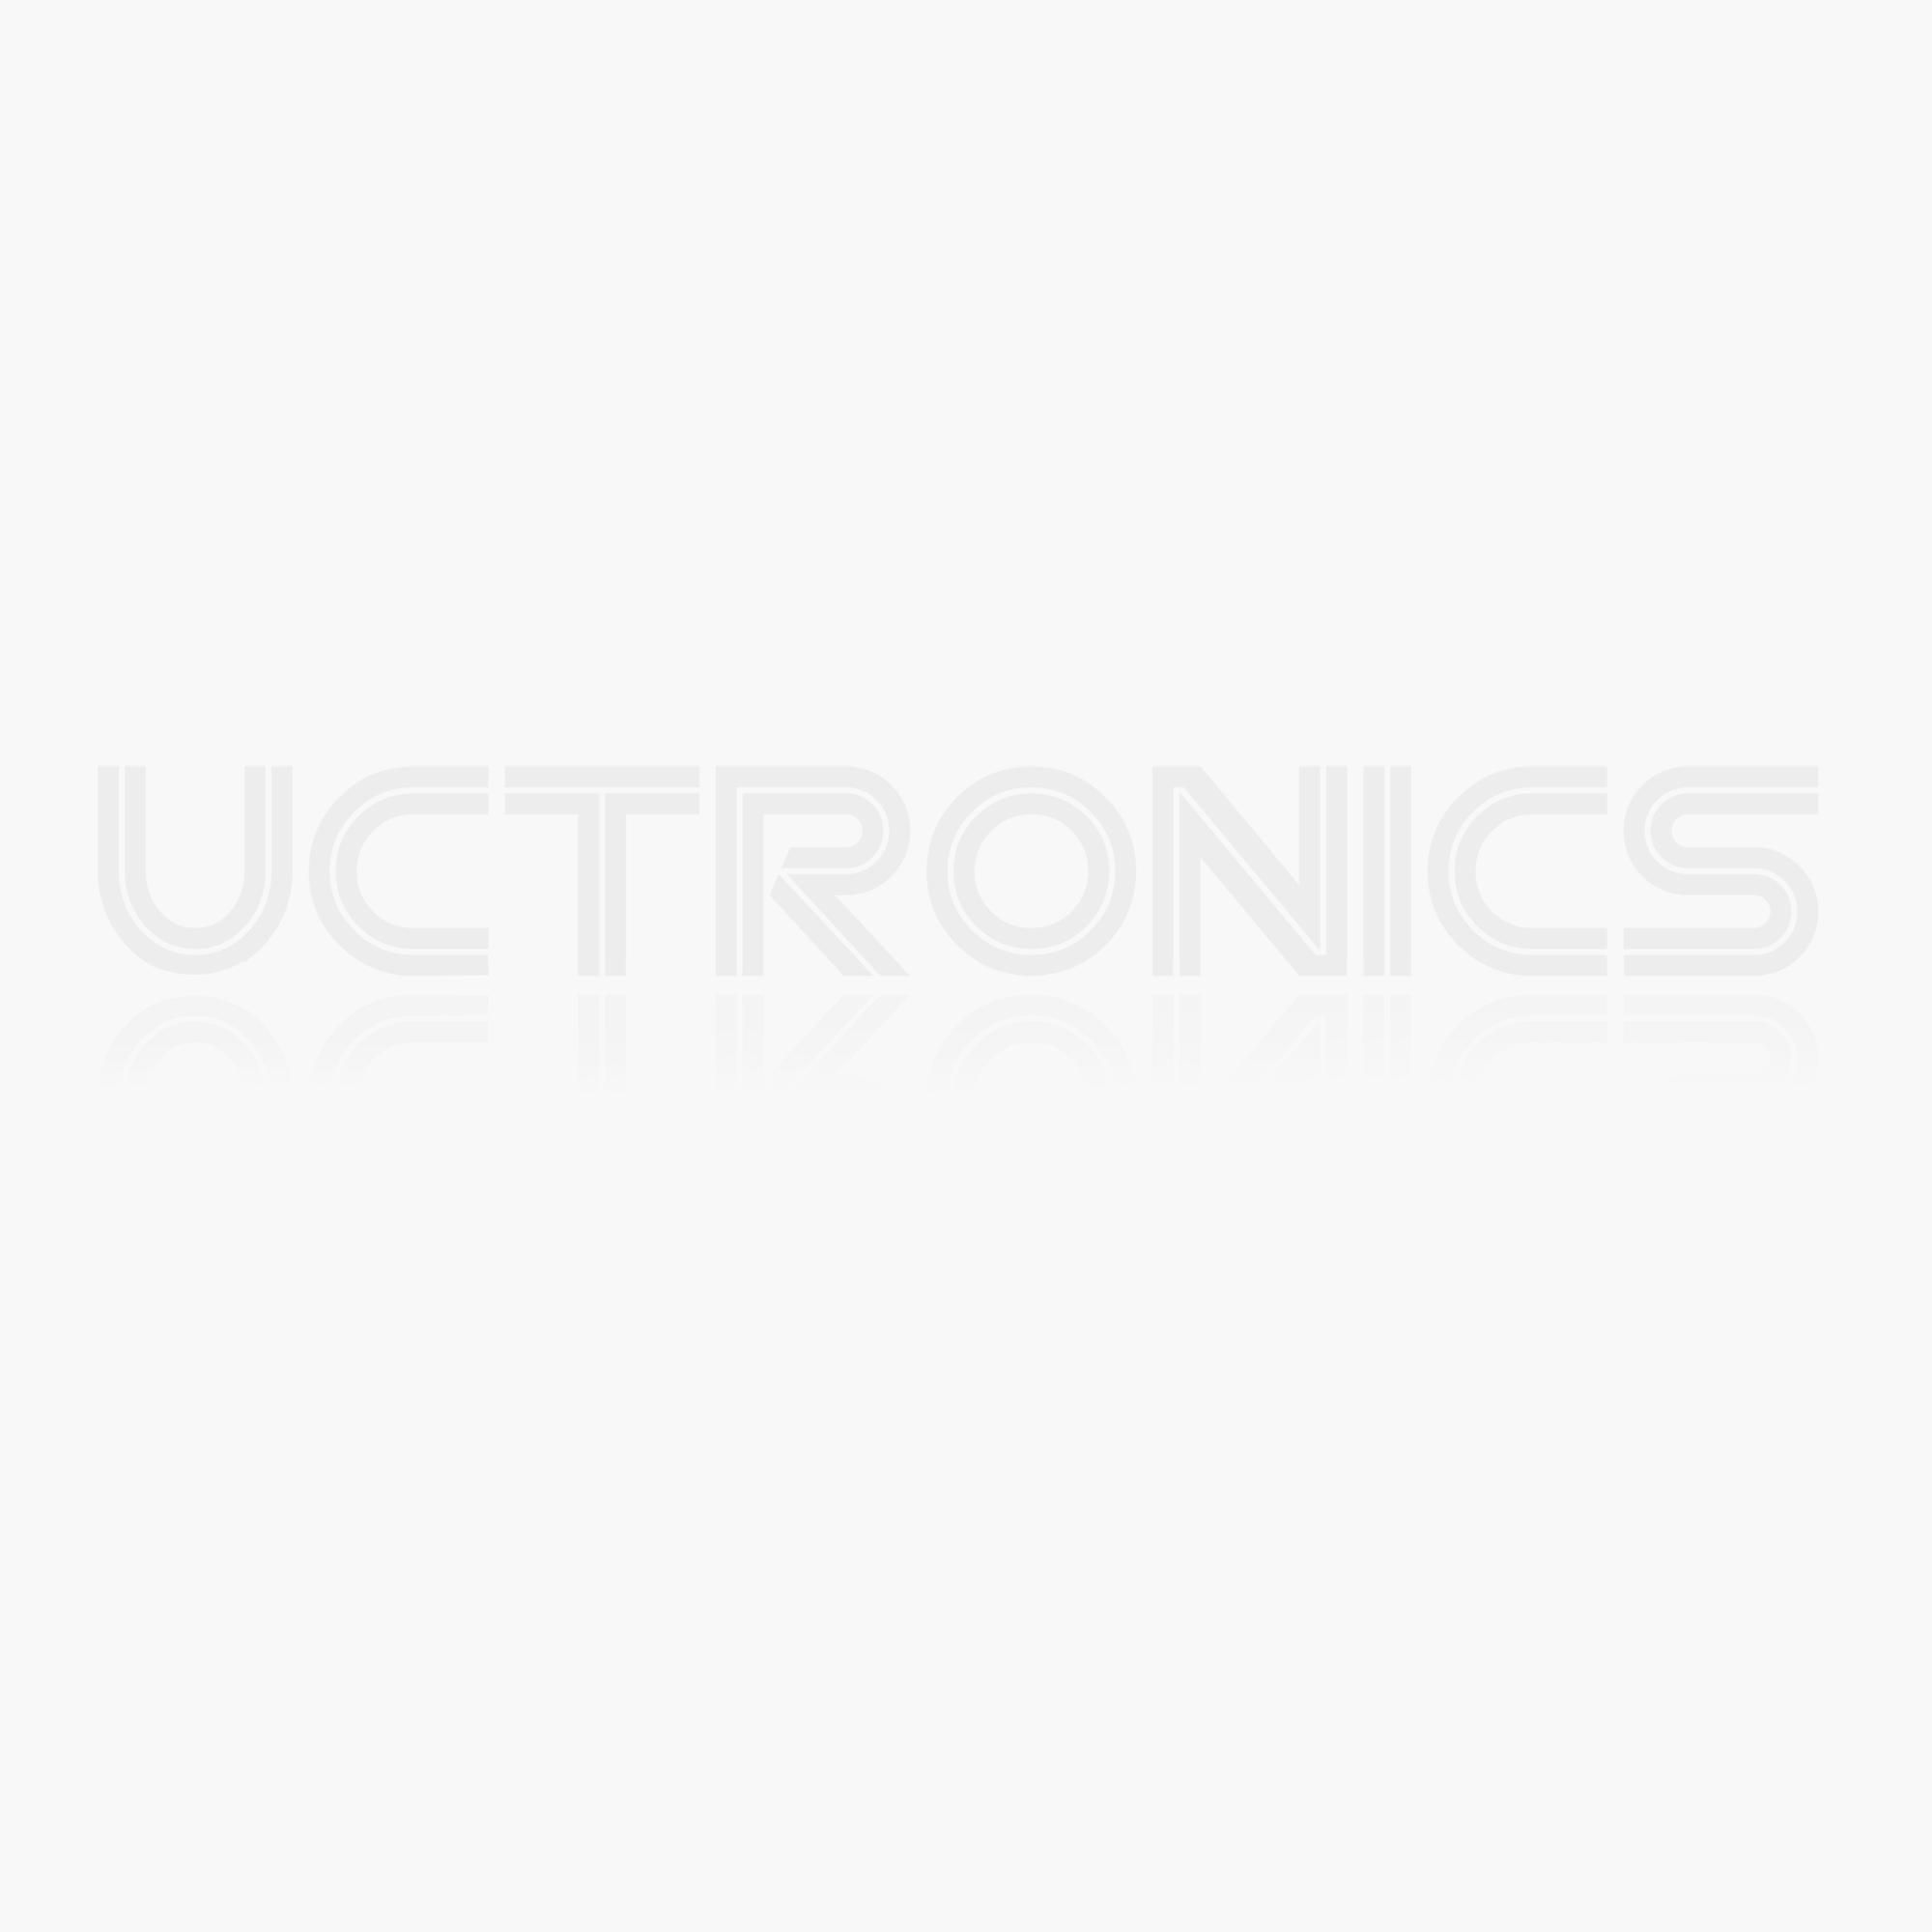 10pcs RUEF500 4A 30V PPTC PolySwitch Resettable Fuse